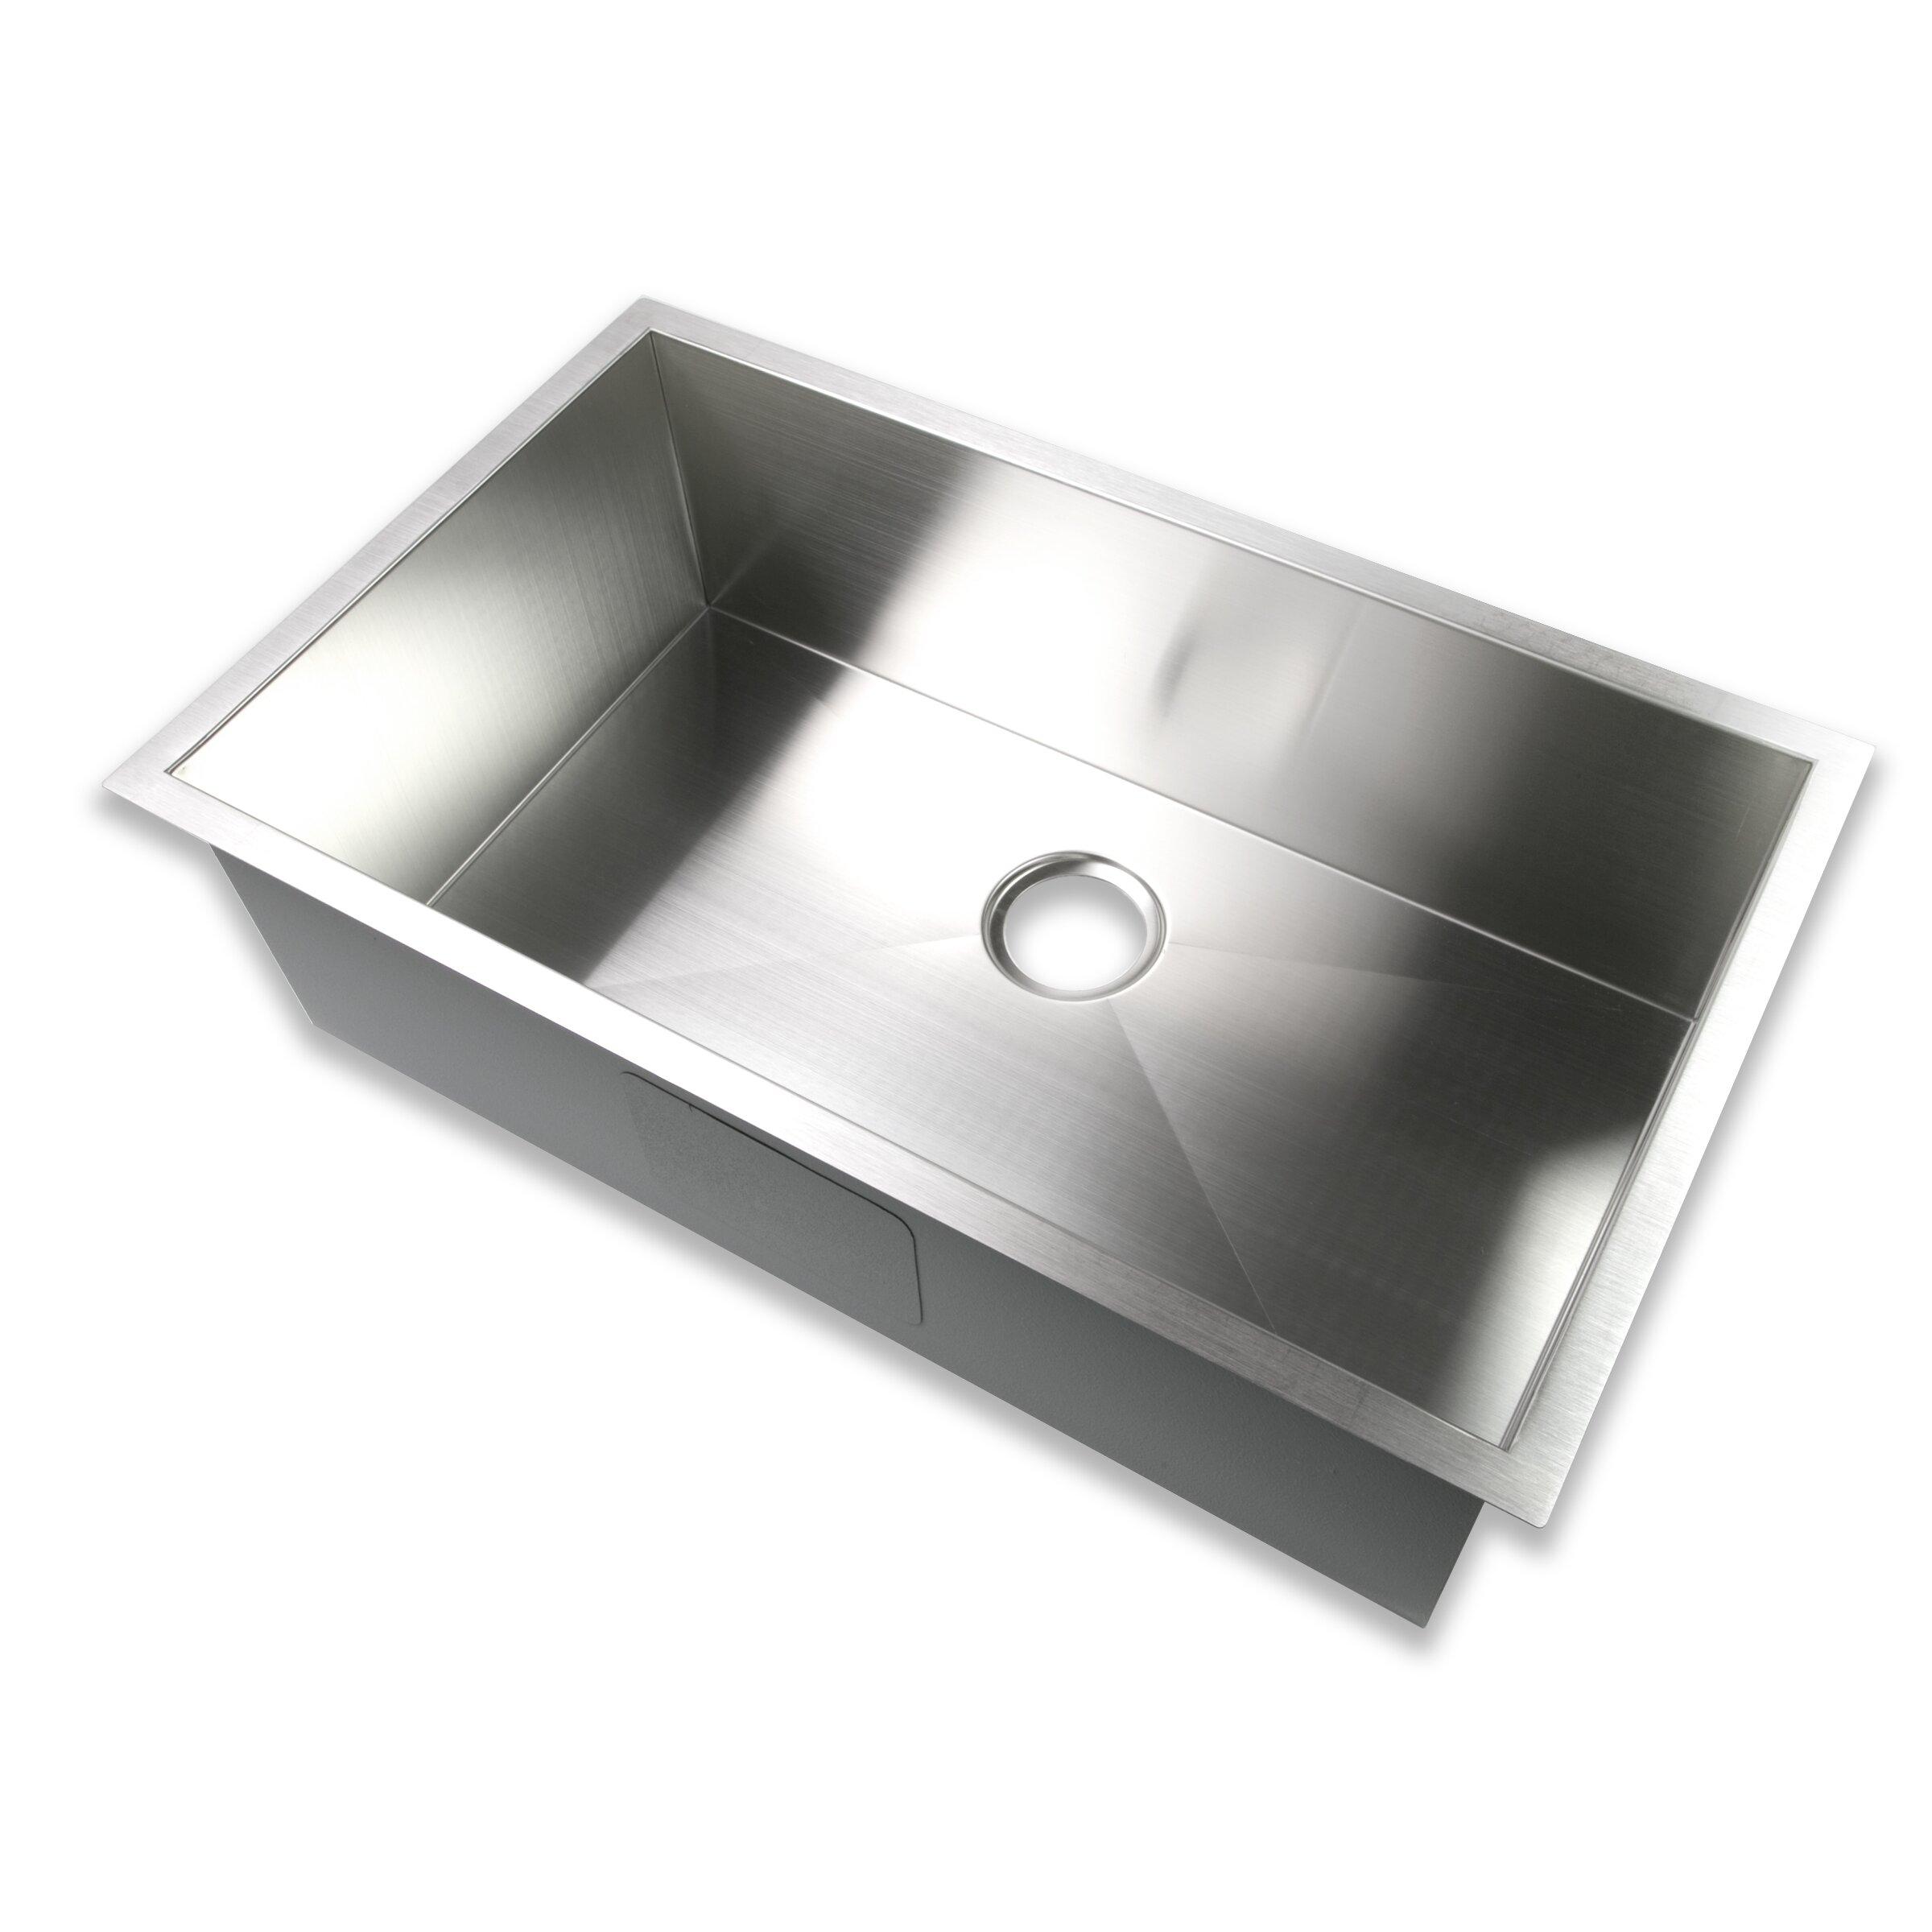 Handmade Stainless Steel Sink : ... Single Bowl 16 Gauge Stainless Steel Handmade Zero Radius Kitchen Sink